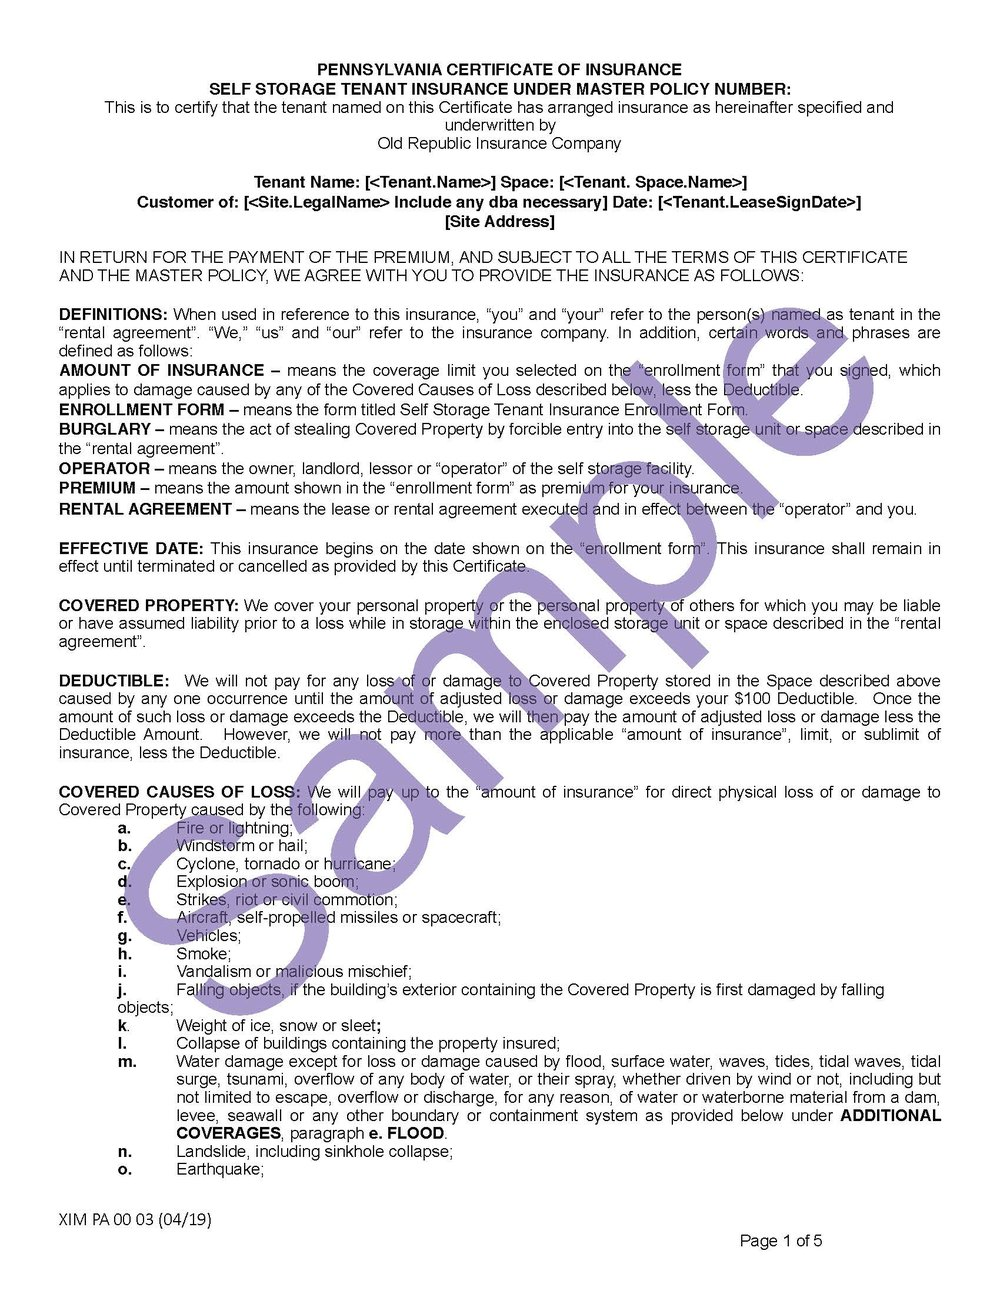 XIM PA 00 03 04 19 Pennsylvania Certificate of InsuranceSample_Page_1.jpg